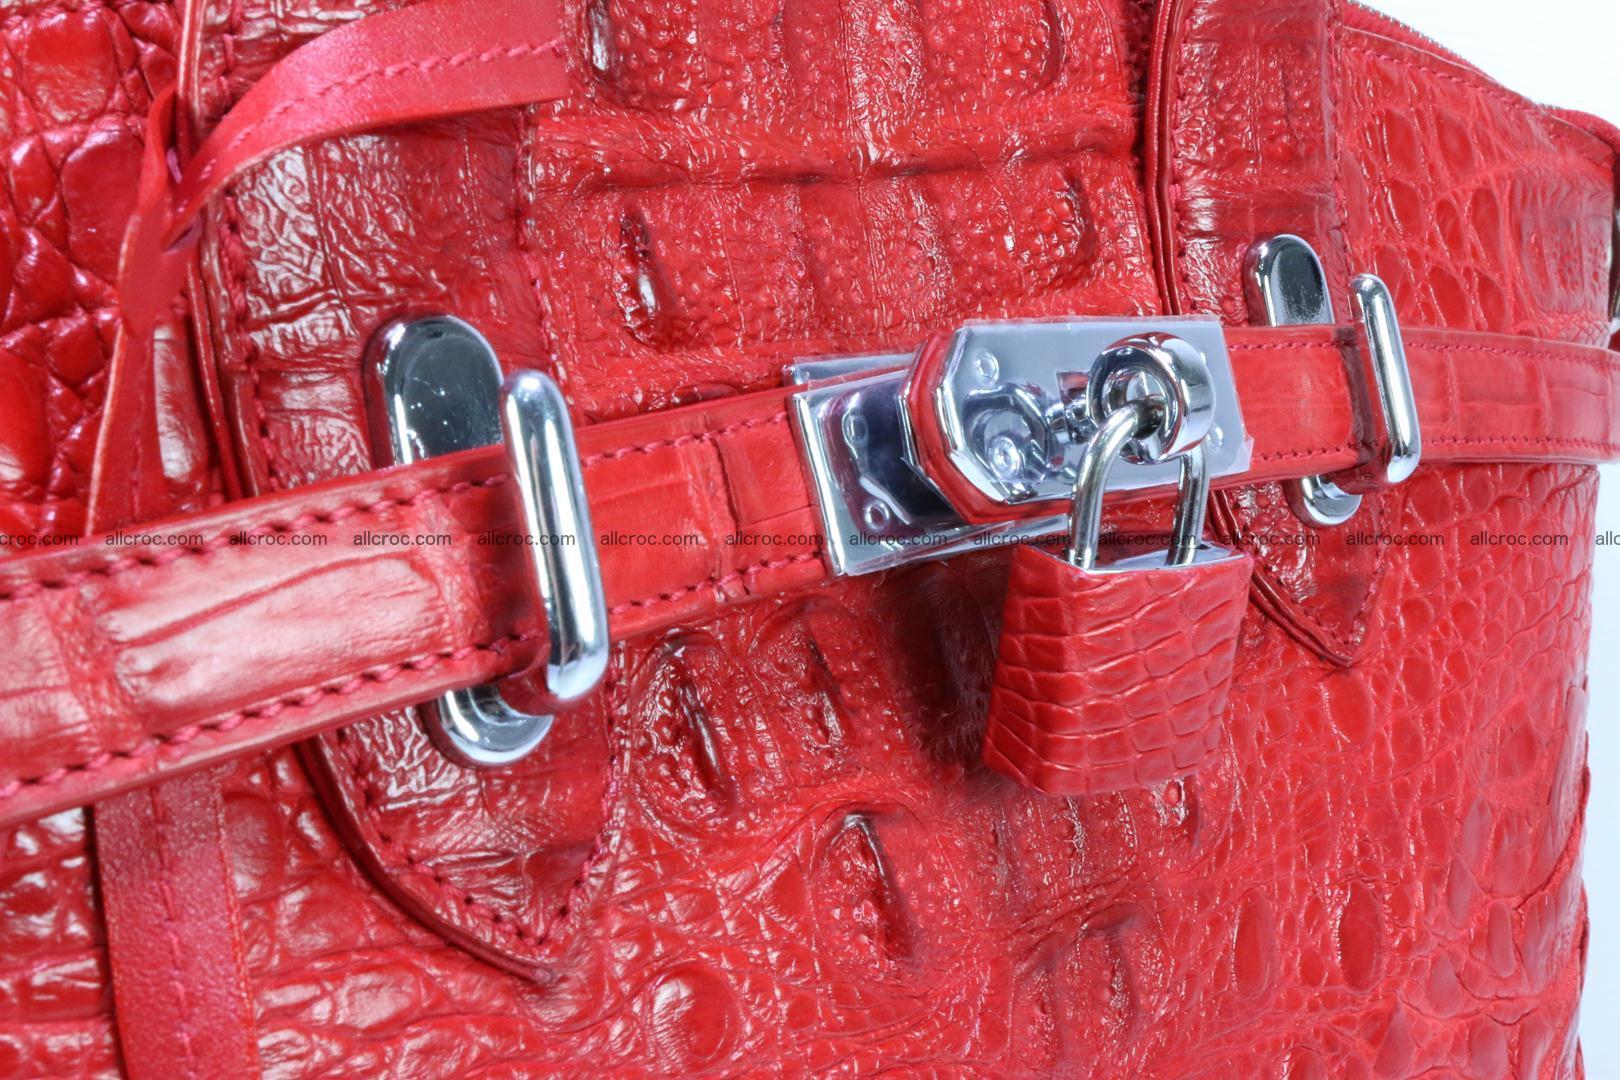 Genuine crocodile handbag for ladies 044 Foto 6